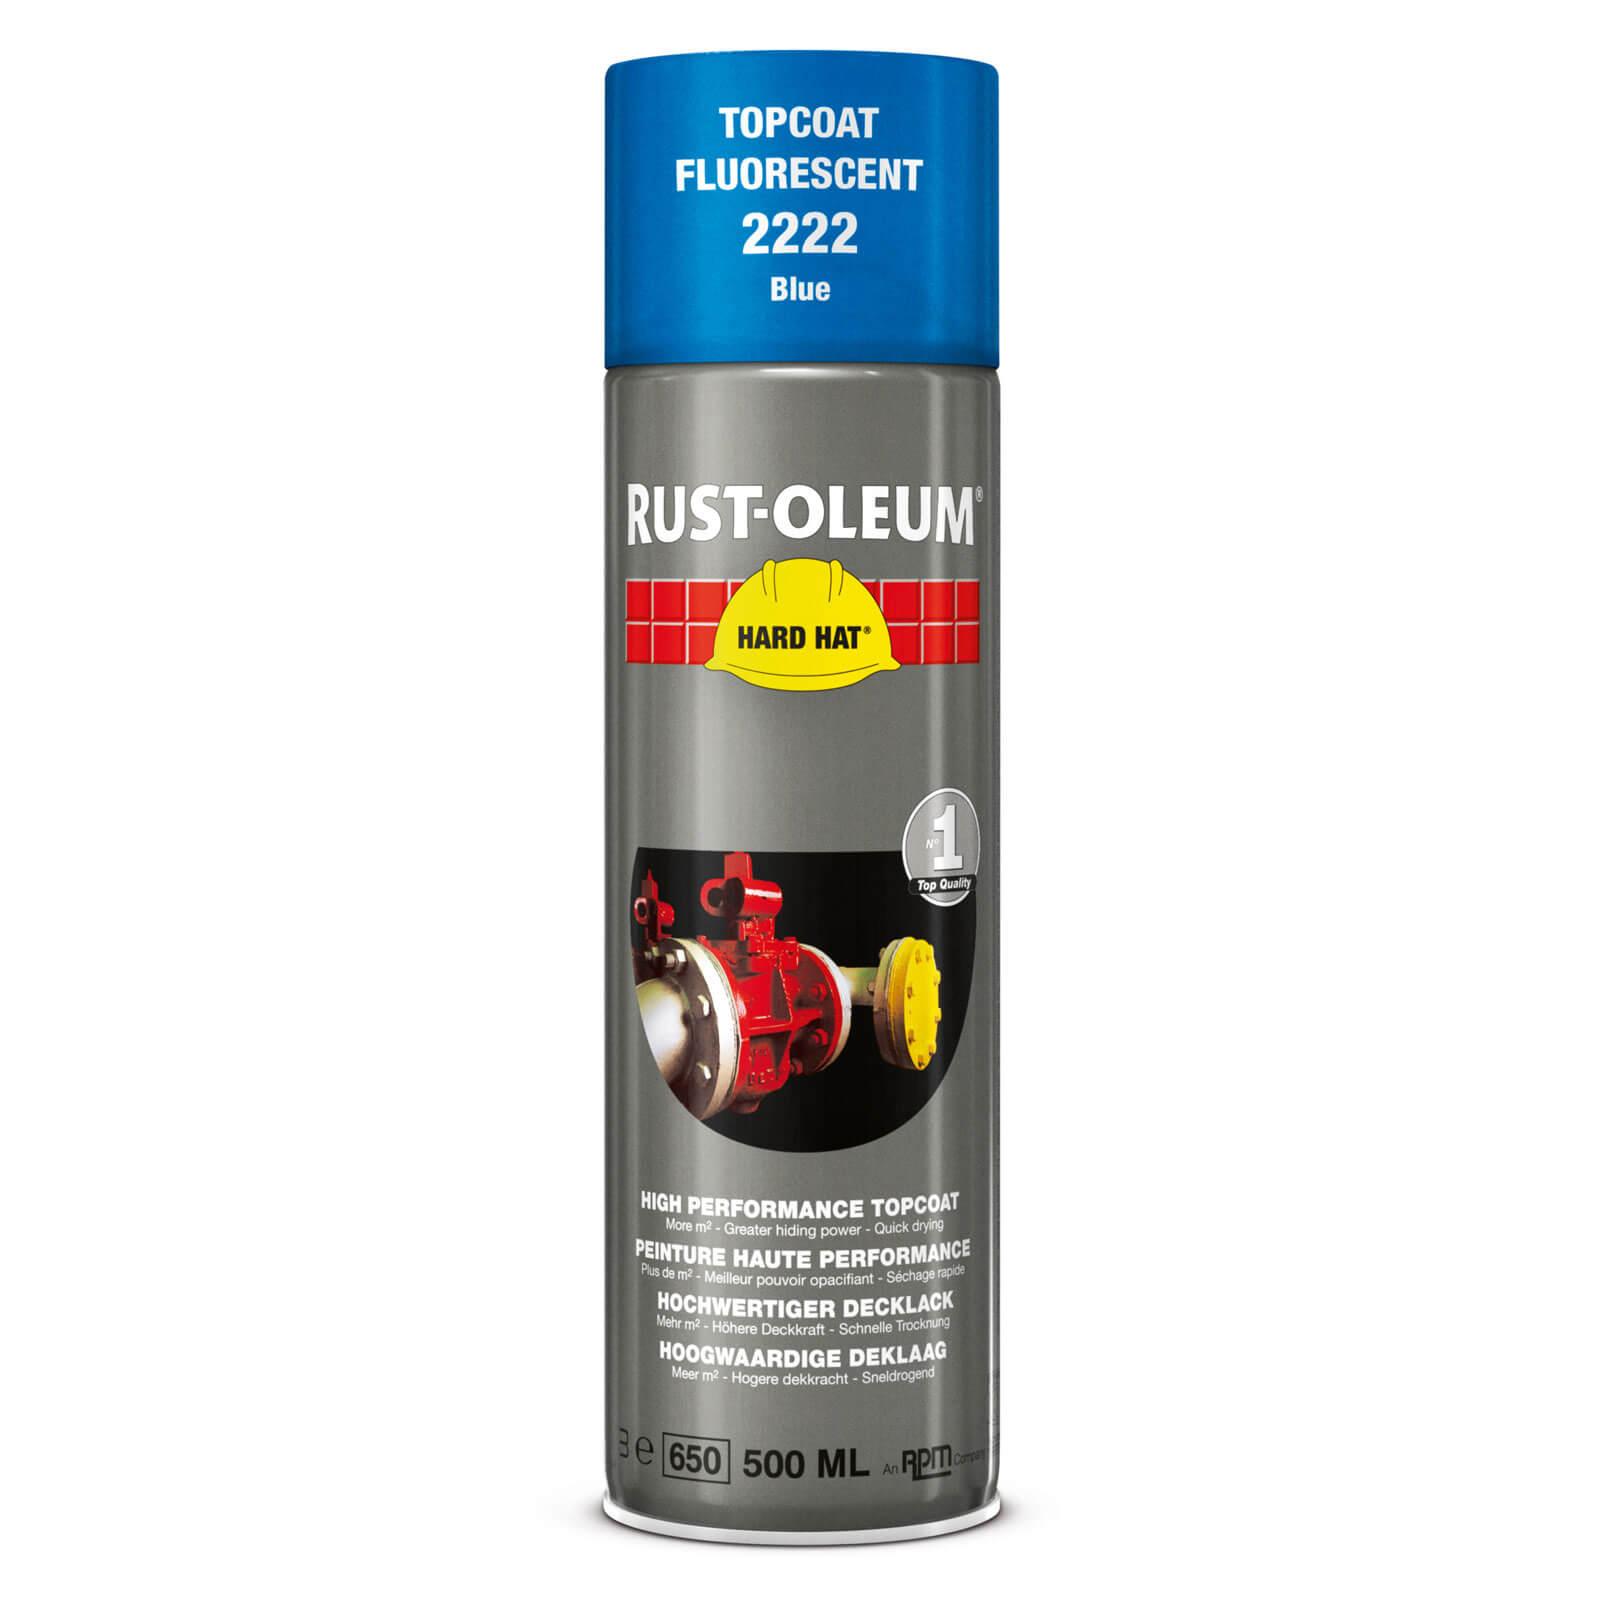 Rust Oleum Hard Hat Fluorescent Spray Paint Blue 500ml